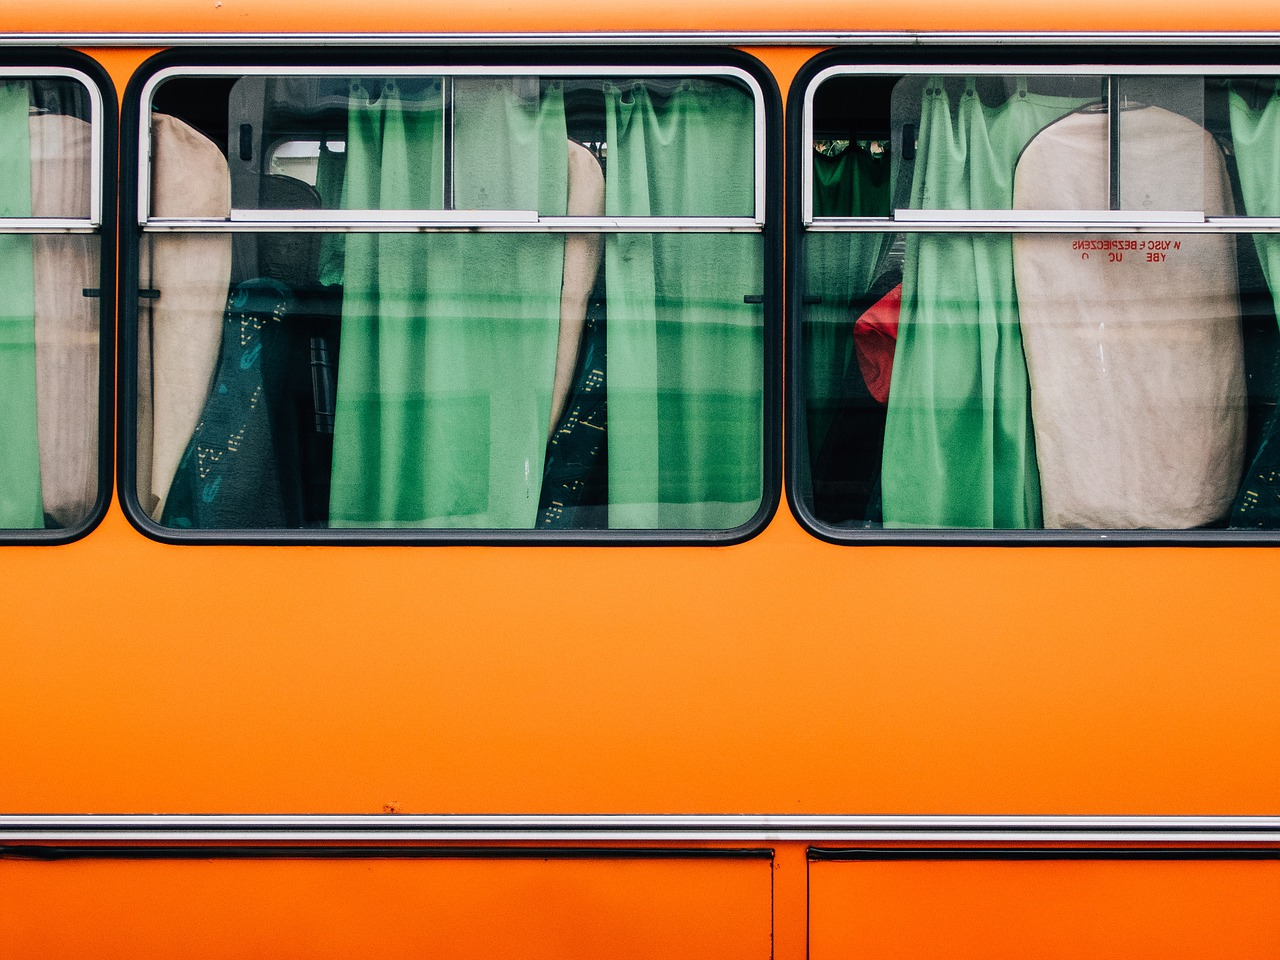 bus-893204_1280.jpg